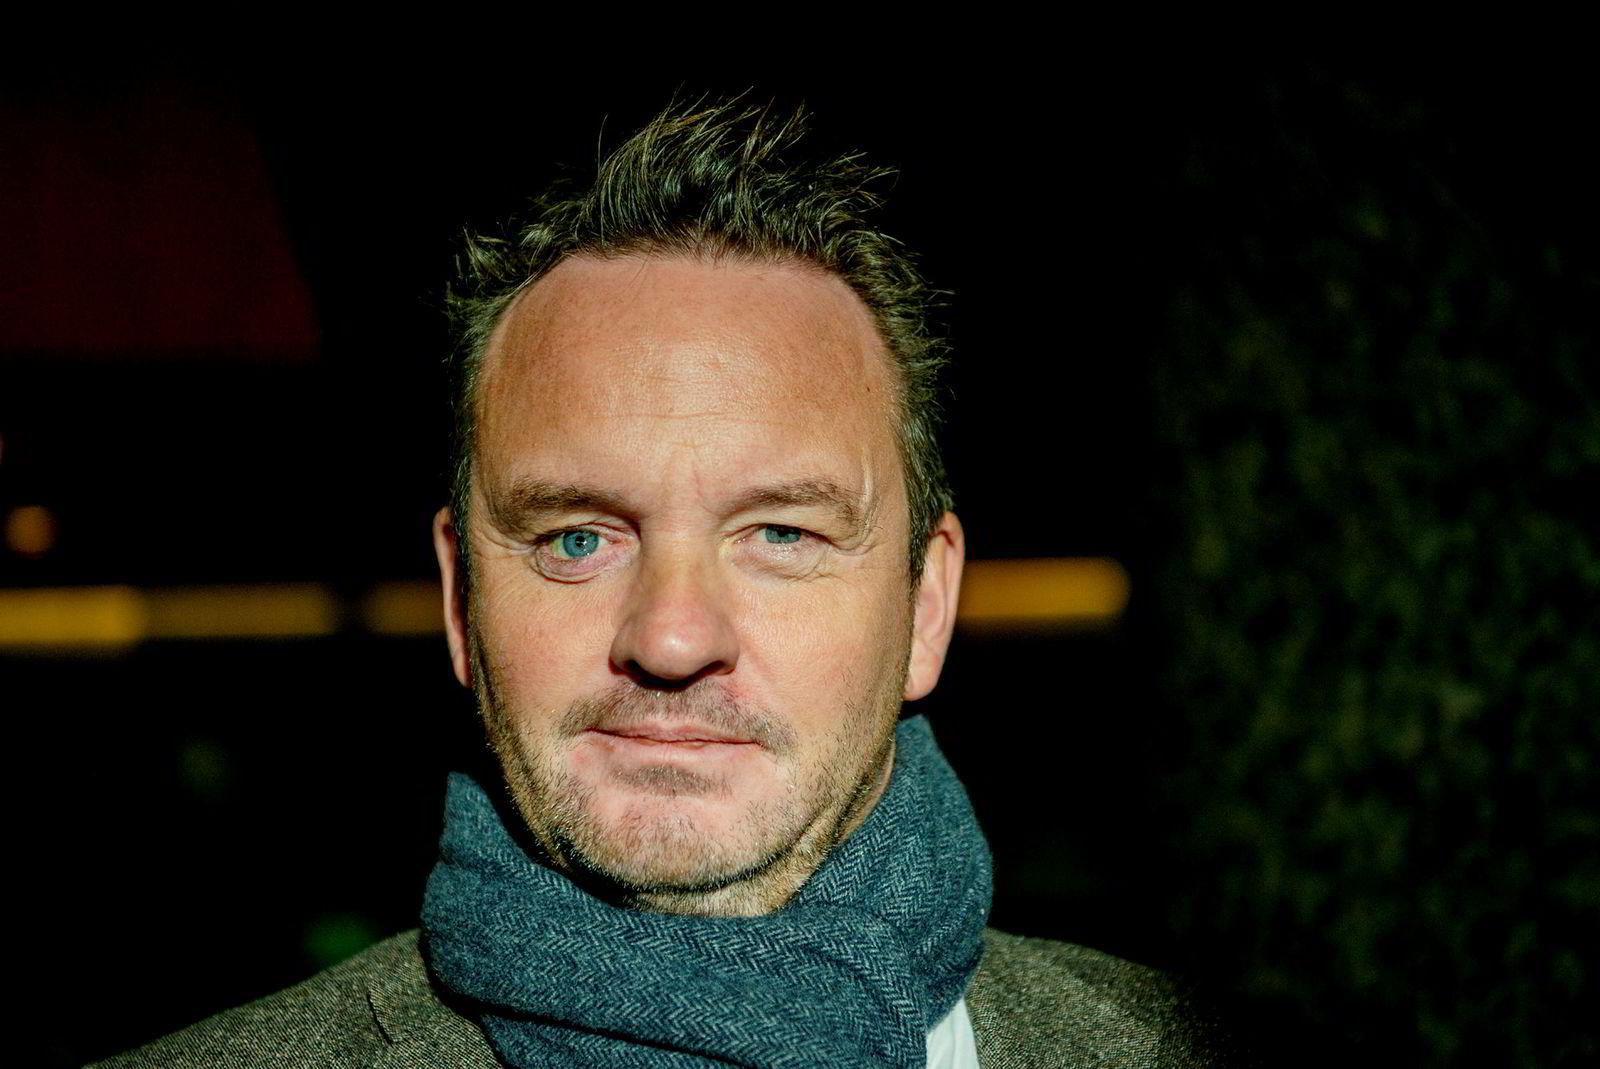 Administrerende direktør Geir Ove Ystmark i Sjømat Norge.